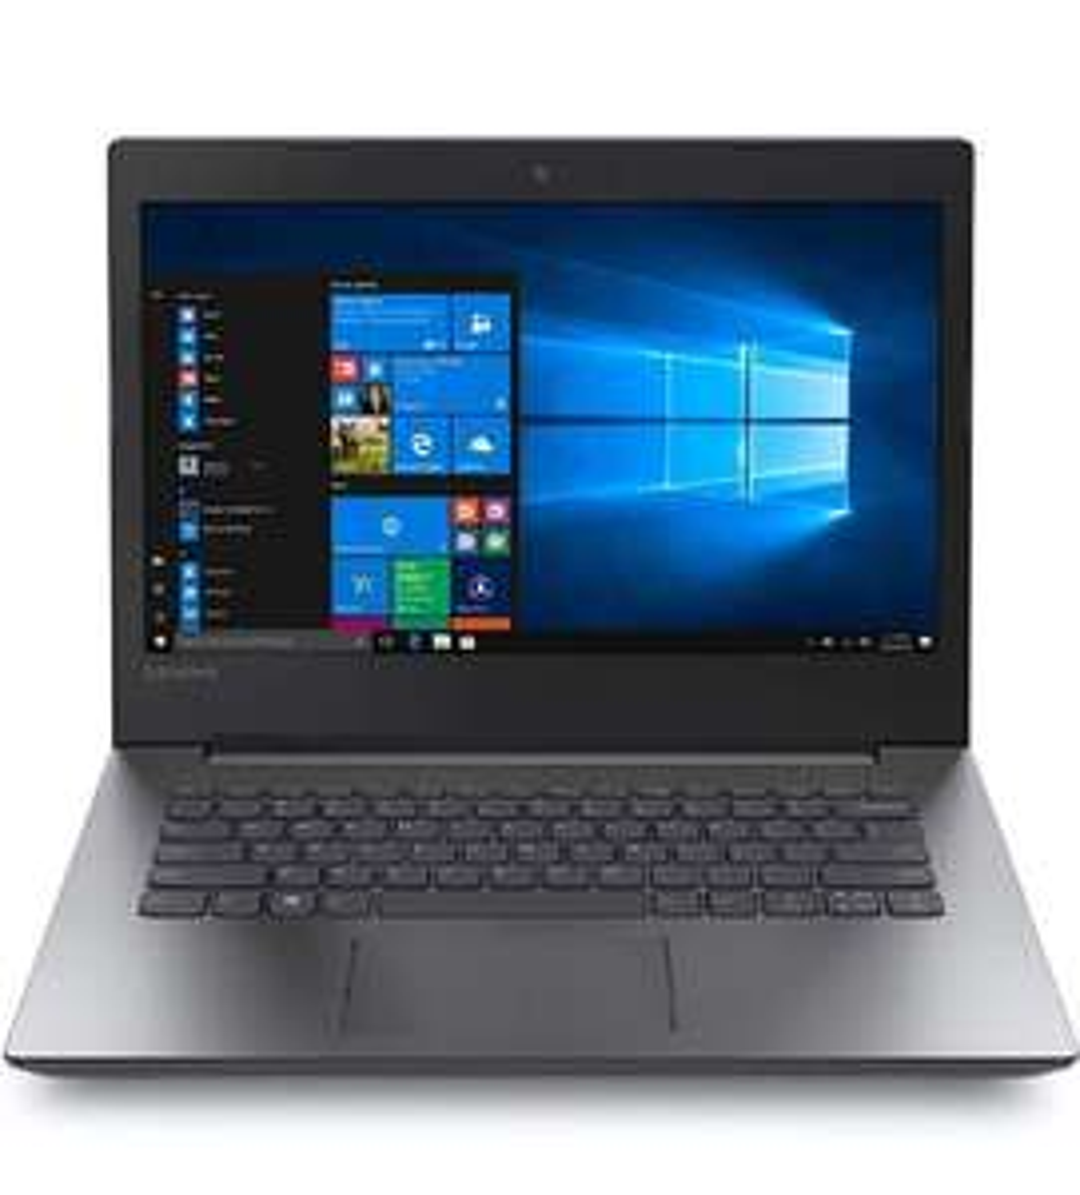 Lenovo 81FK00EMSP, Ordenador, SATA 3, Intel Core i7-8750H, Windows 10, 8GB RAM   1TB HDD   W10, Multicolor at Amazon Spain £568.40